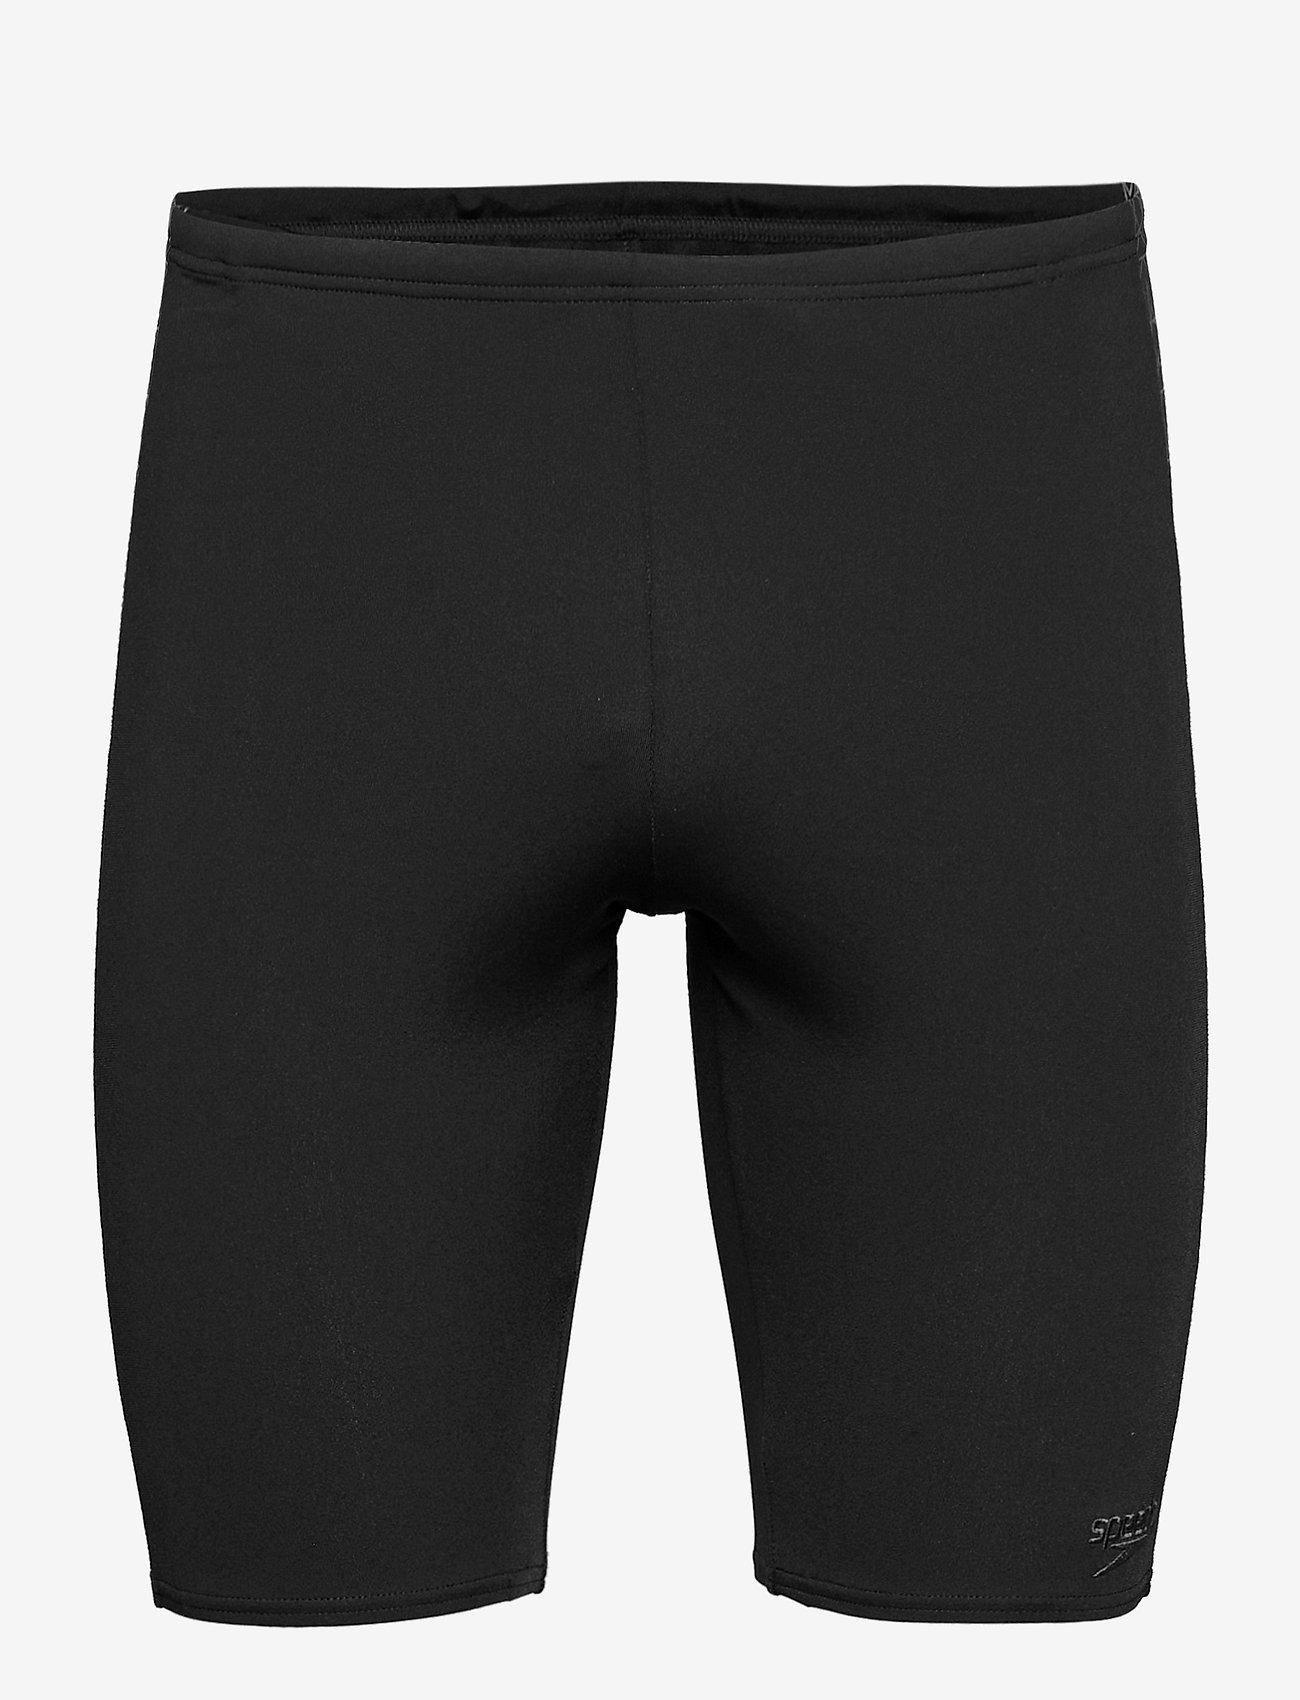 Speedo - Boomstar Splice Jammer - briefs - black/oxid grey - 0